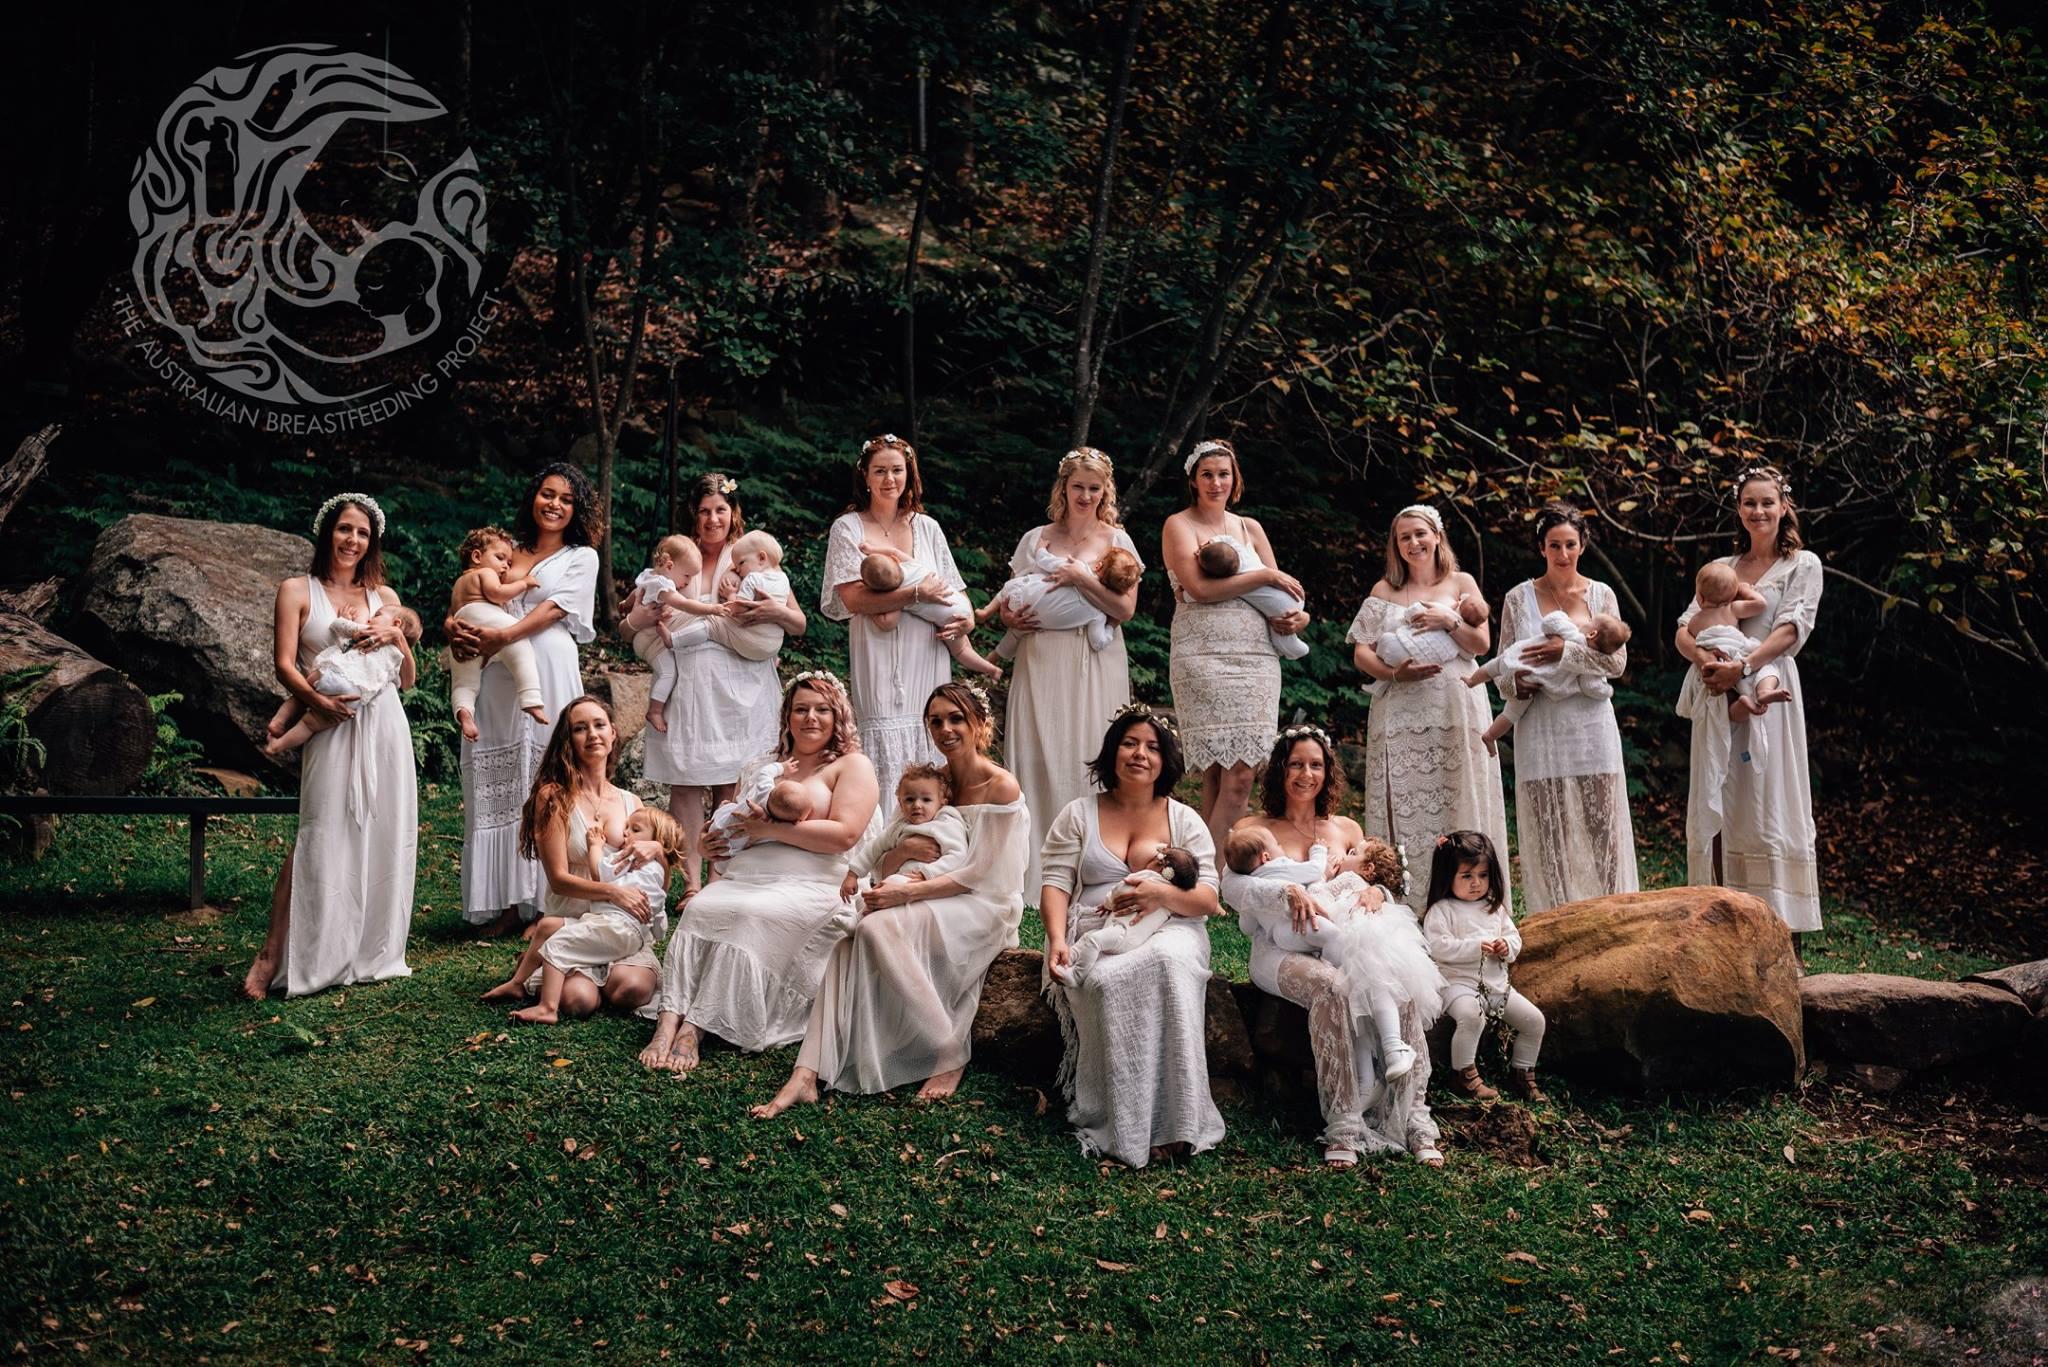 Media photo for the Australian Breastfeeding Project, Illawarra session